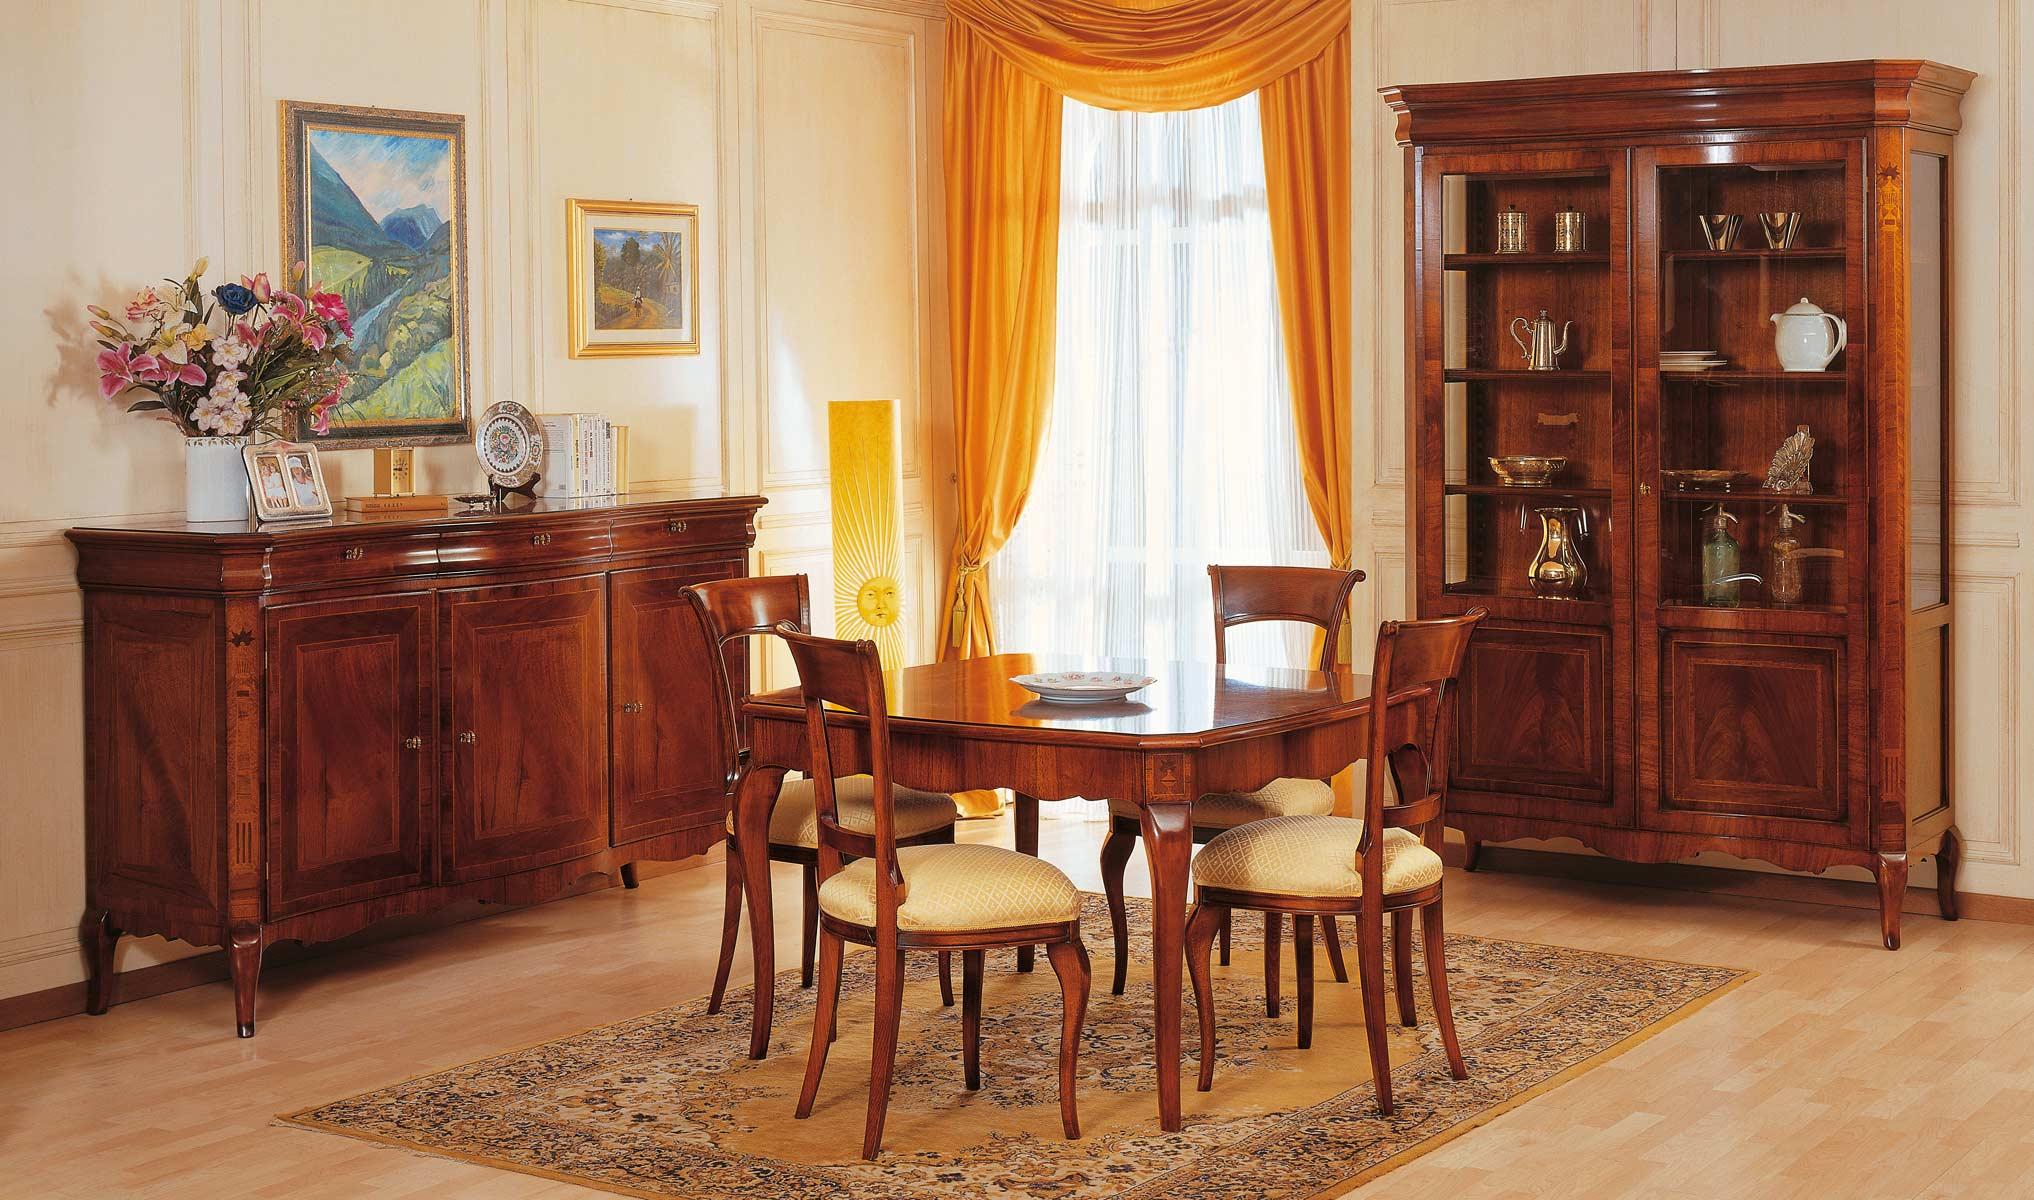 Sala Da Pranzo In Stile 800 Francese Vimercati Meda #BA8911 2034 1200 Quadri Per Sala Da Pranzo Classica